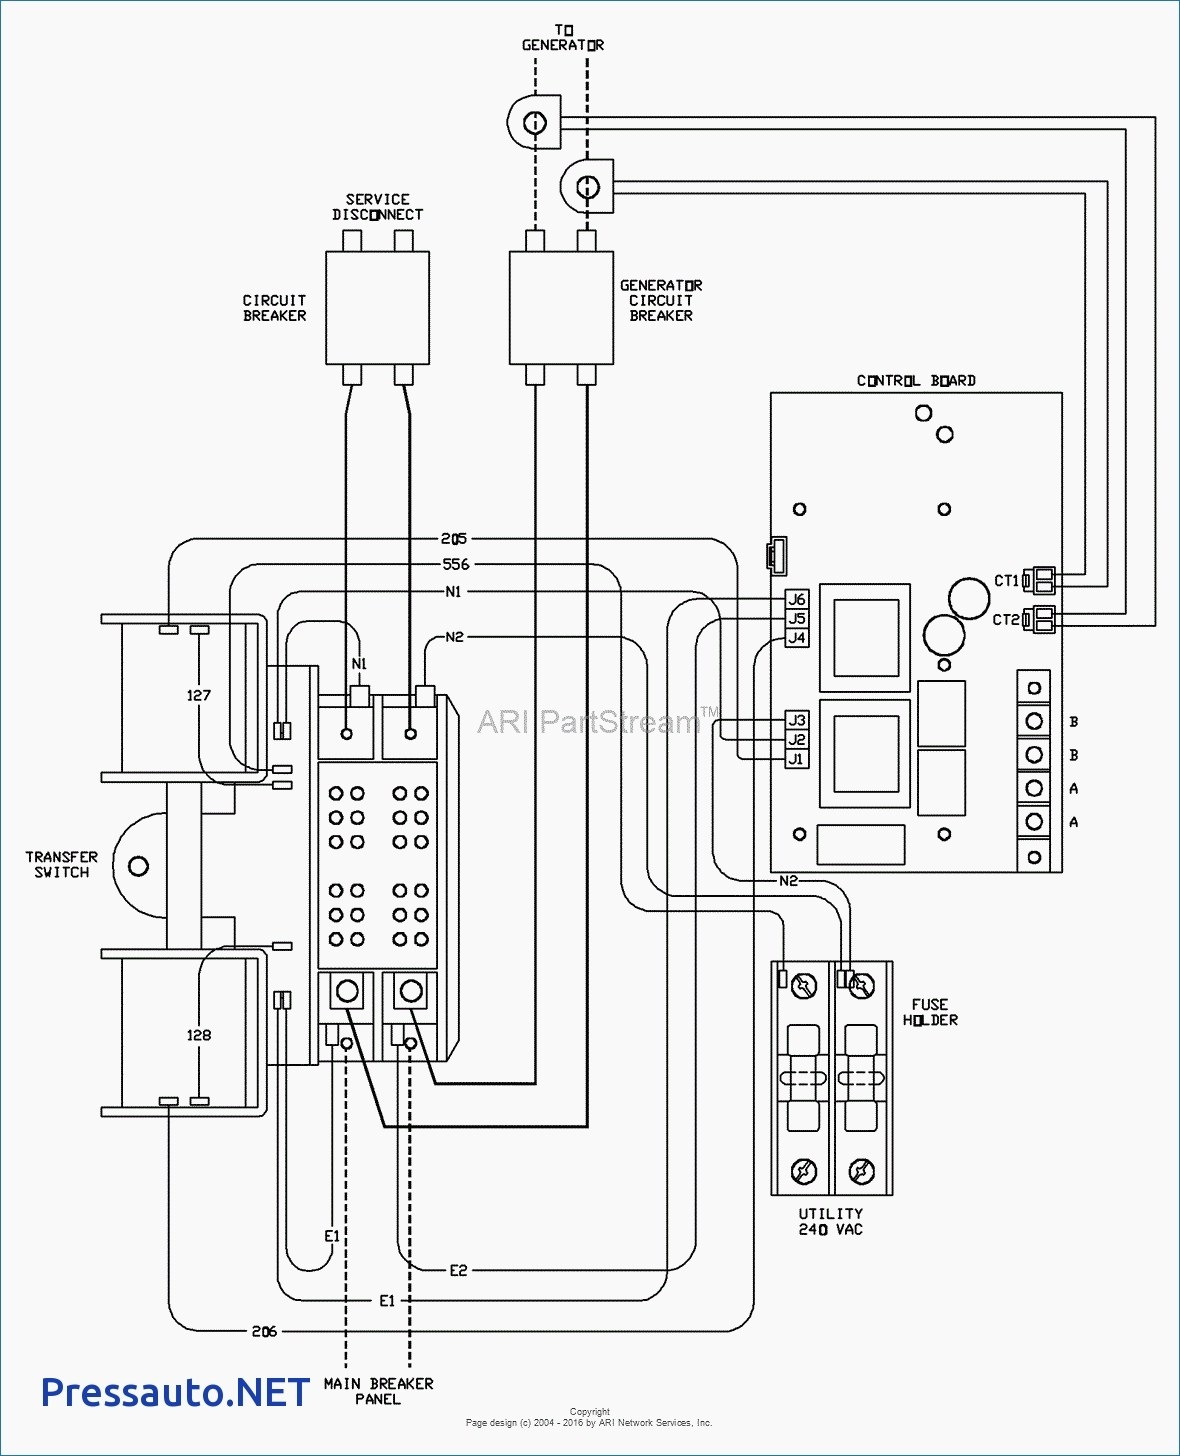 reliance generator transfer switch wiring diagram Collection-Whole House Transfer Switch Wiring Diagram Beautiful Generator Manual Transfer Switch Wiring Diagram 7-o